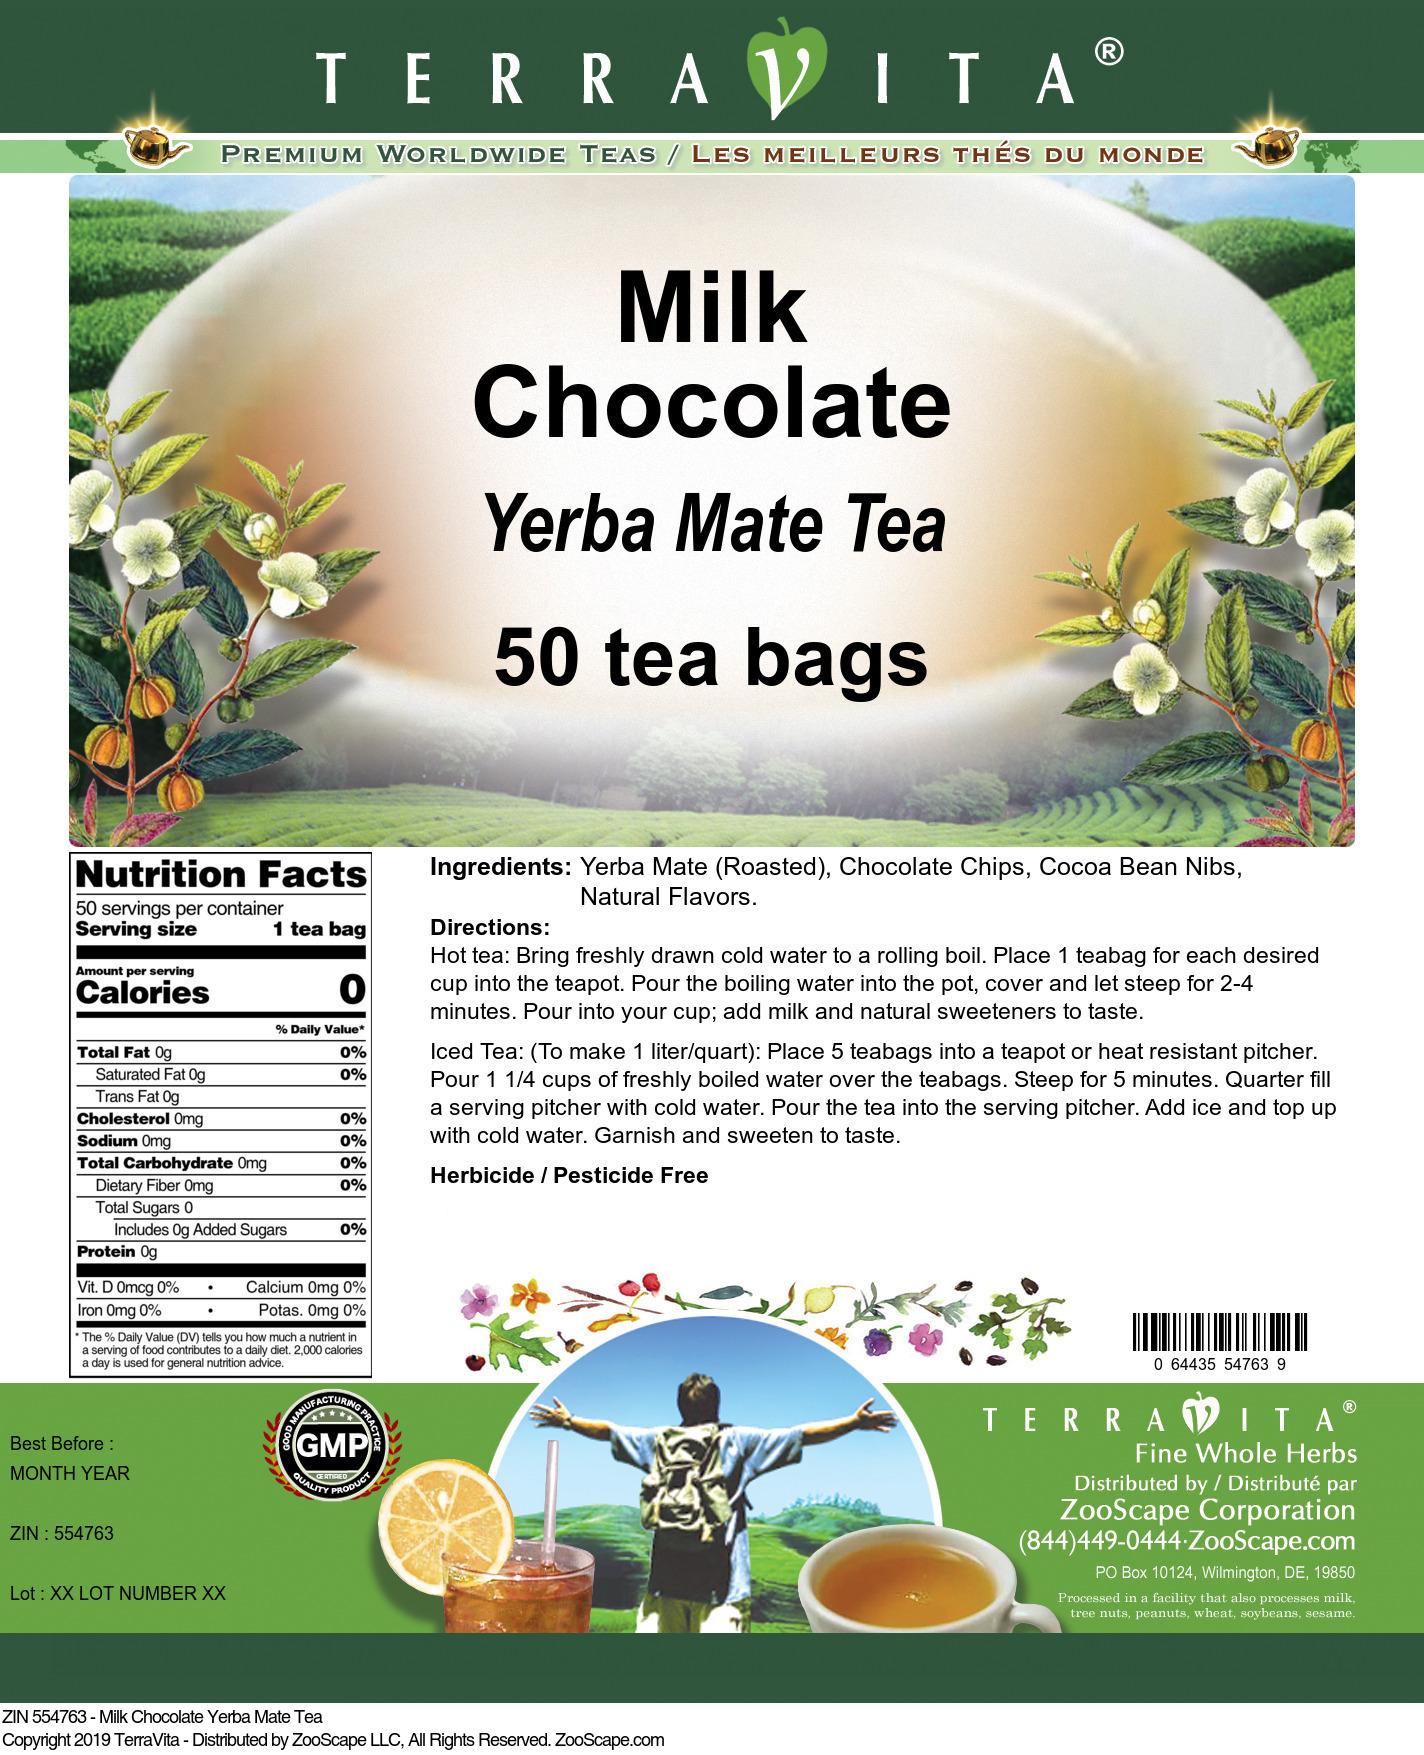 Milk Chocolate Yerba Mate Tea